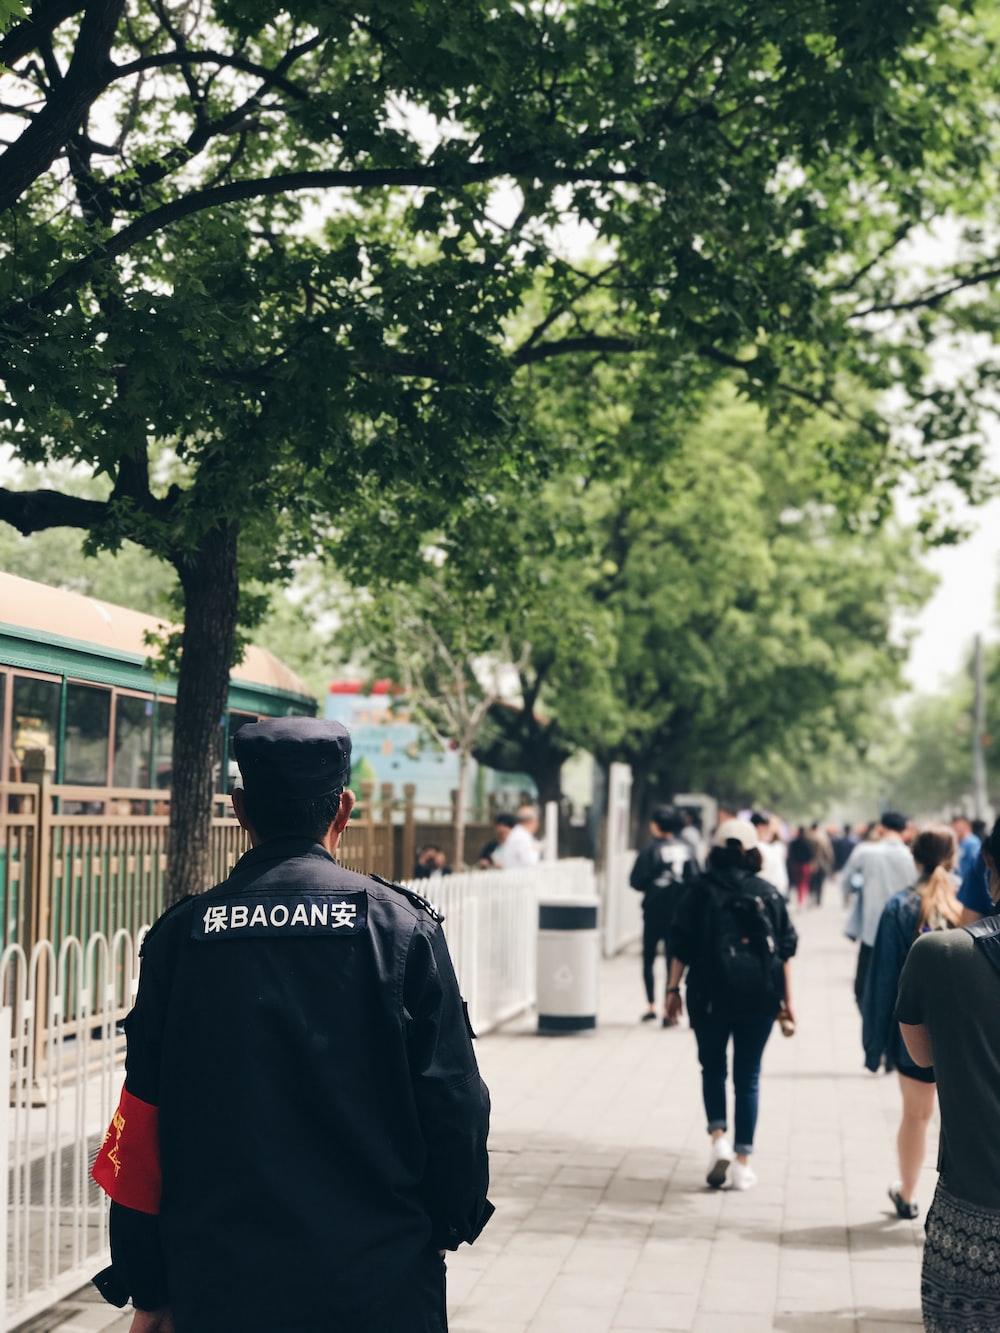 people walking on sidewalk near fence and trees